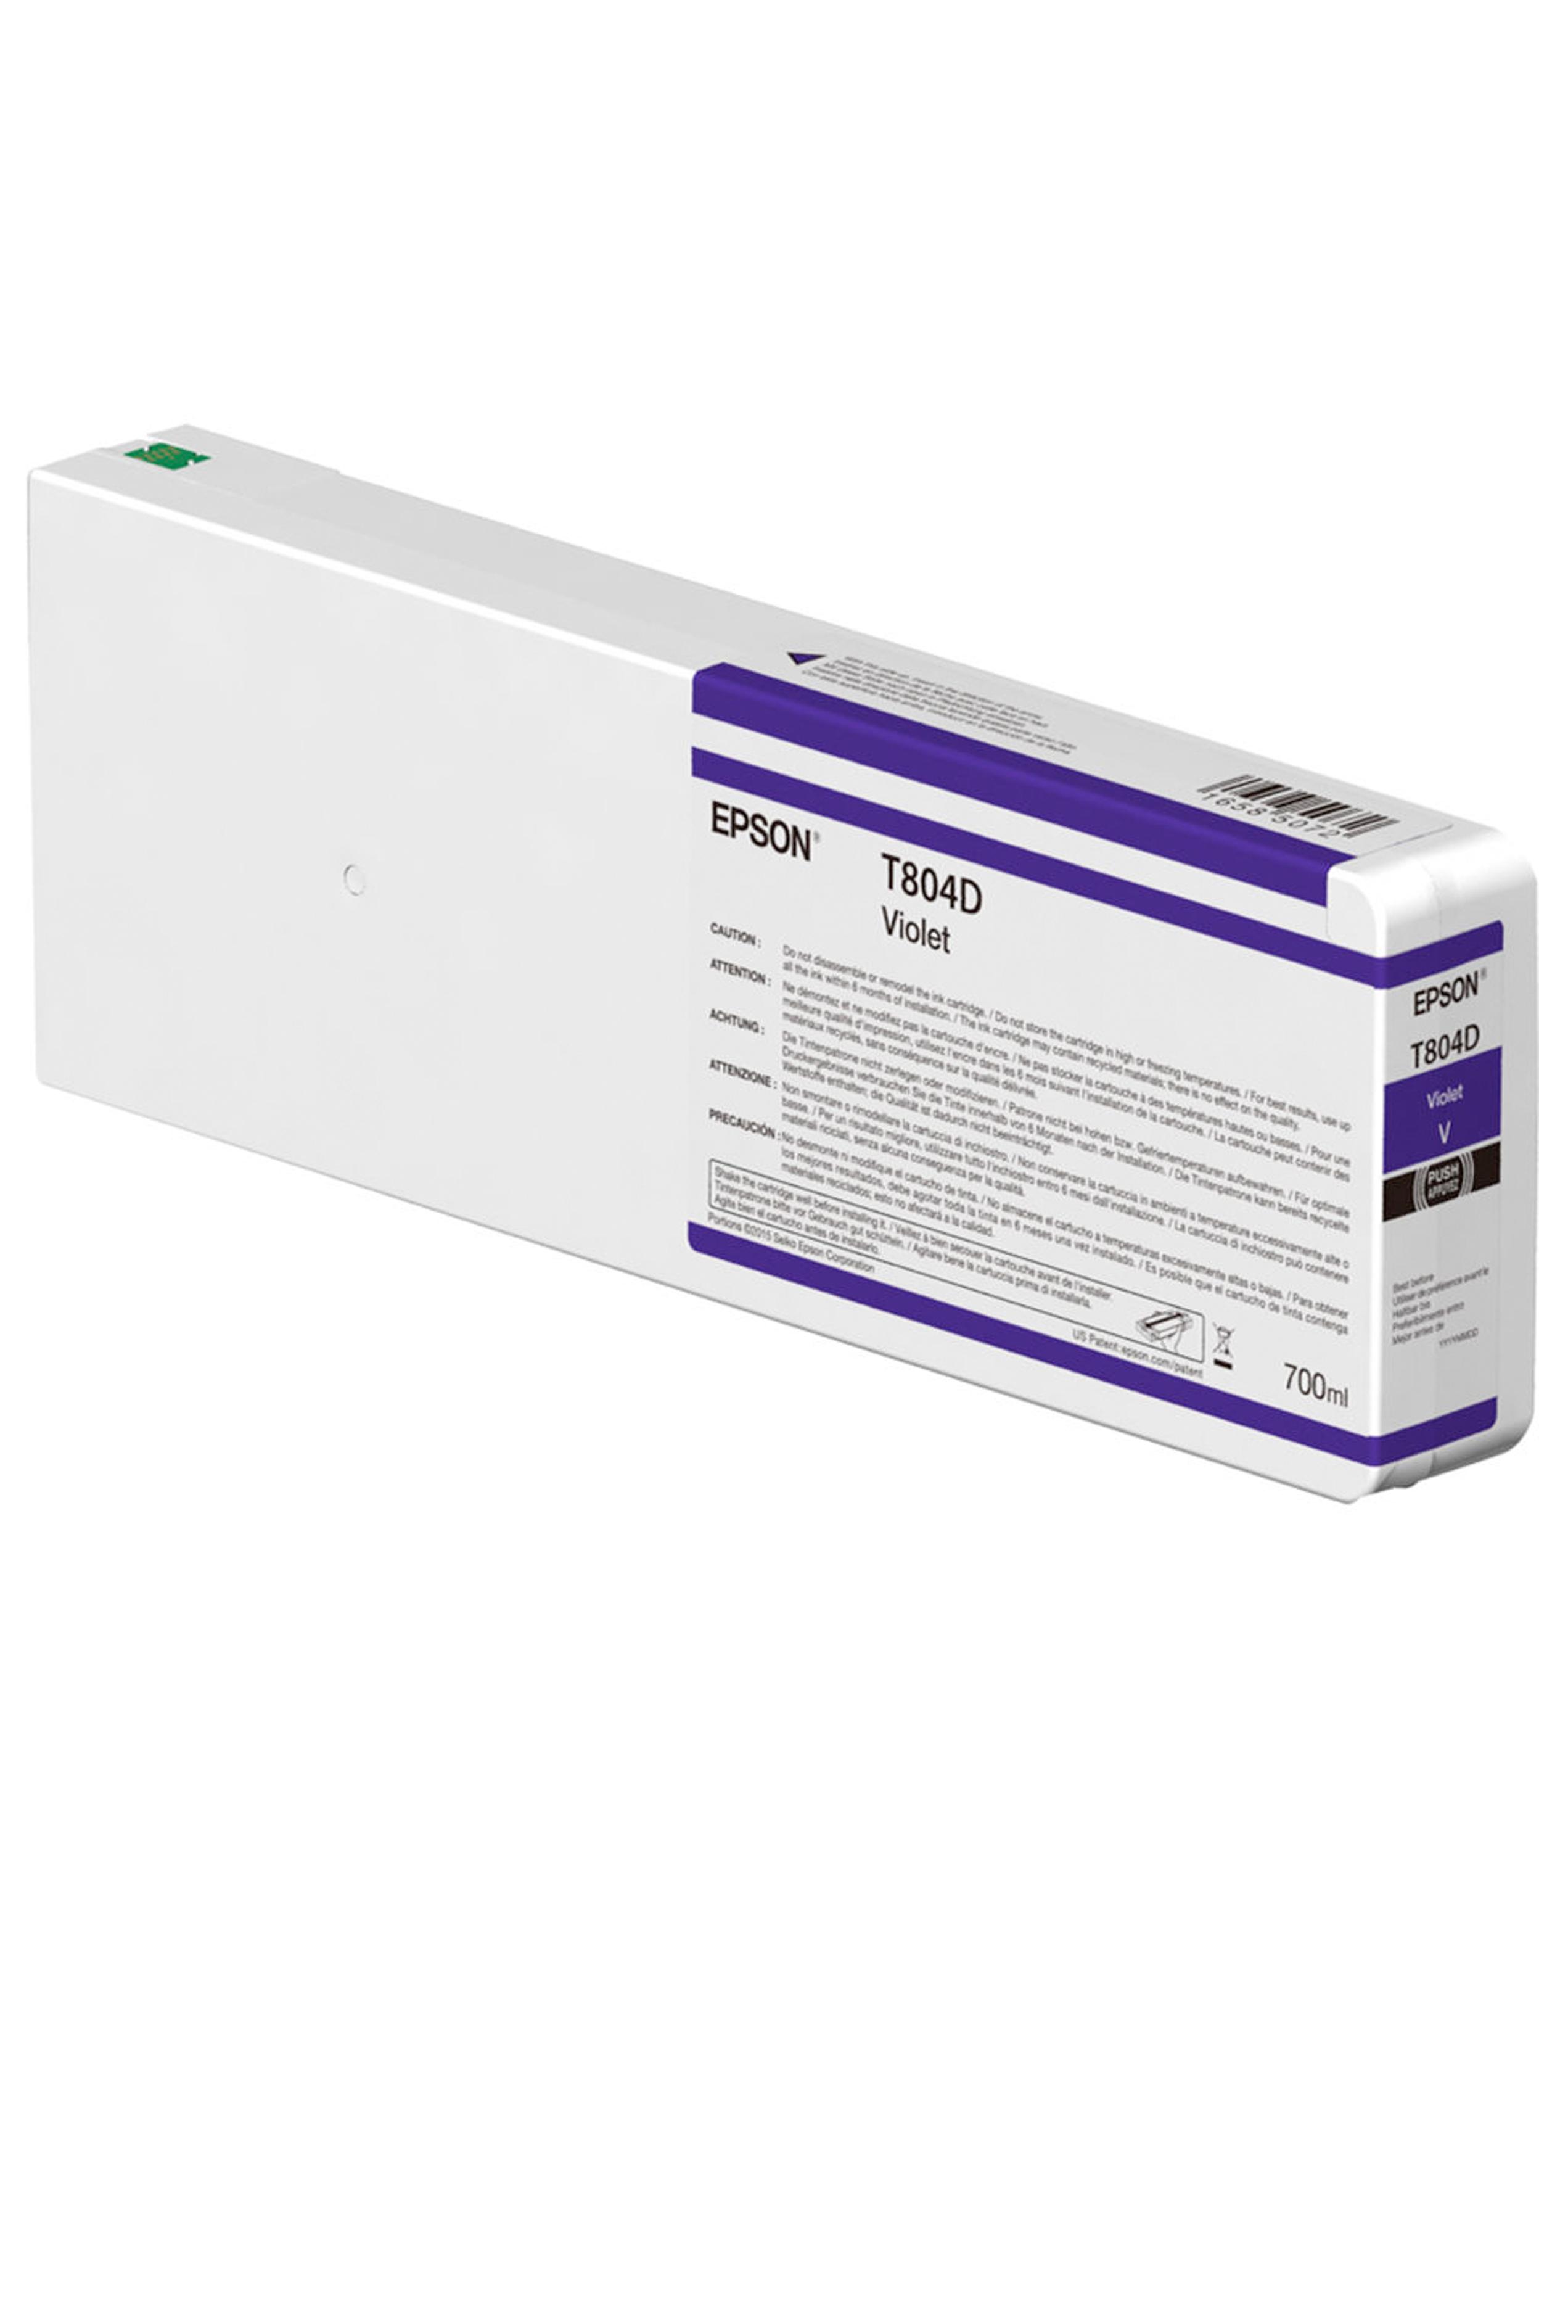 Epson EPSON XH VIOLET INK (700 ML) (T804D00)